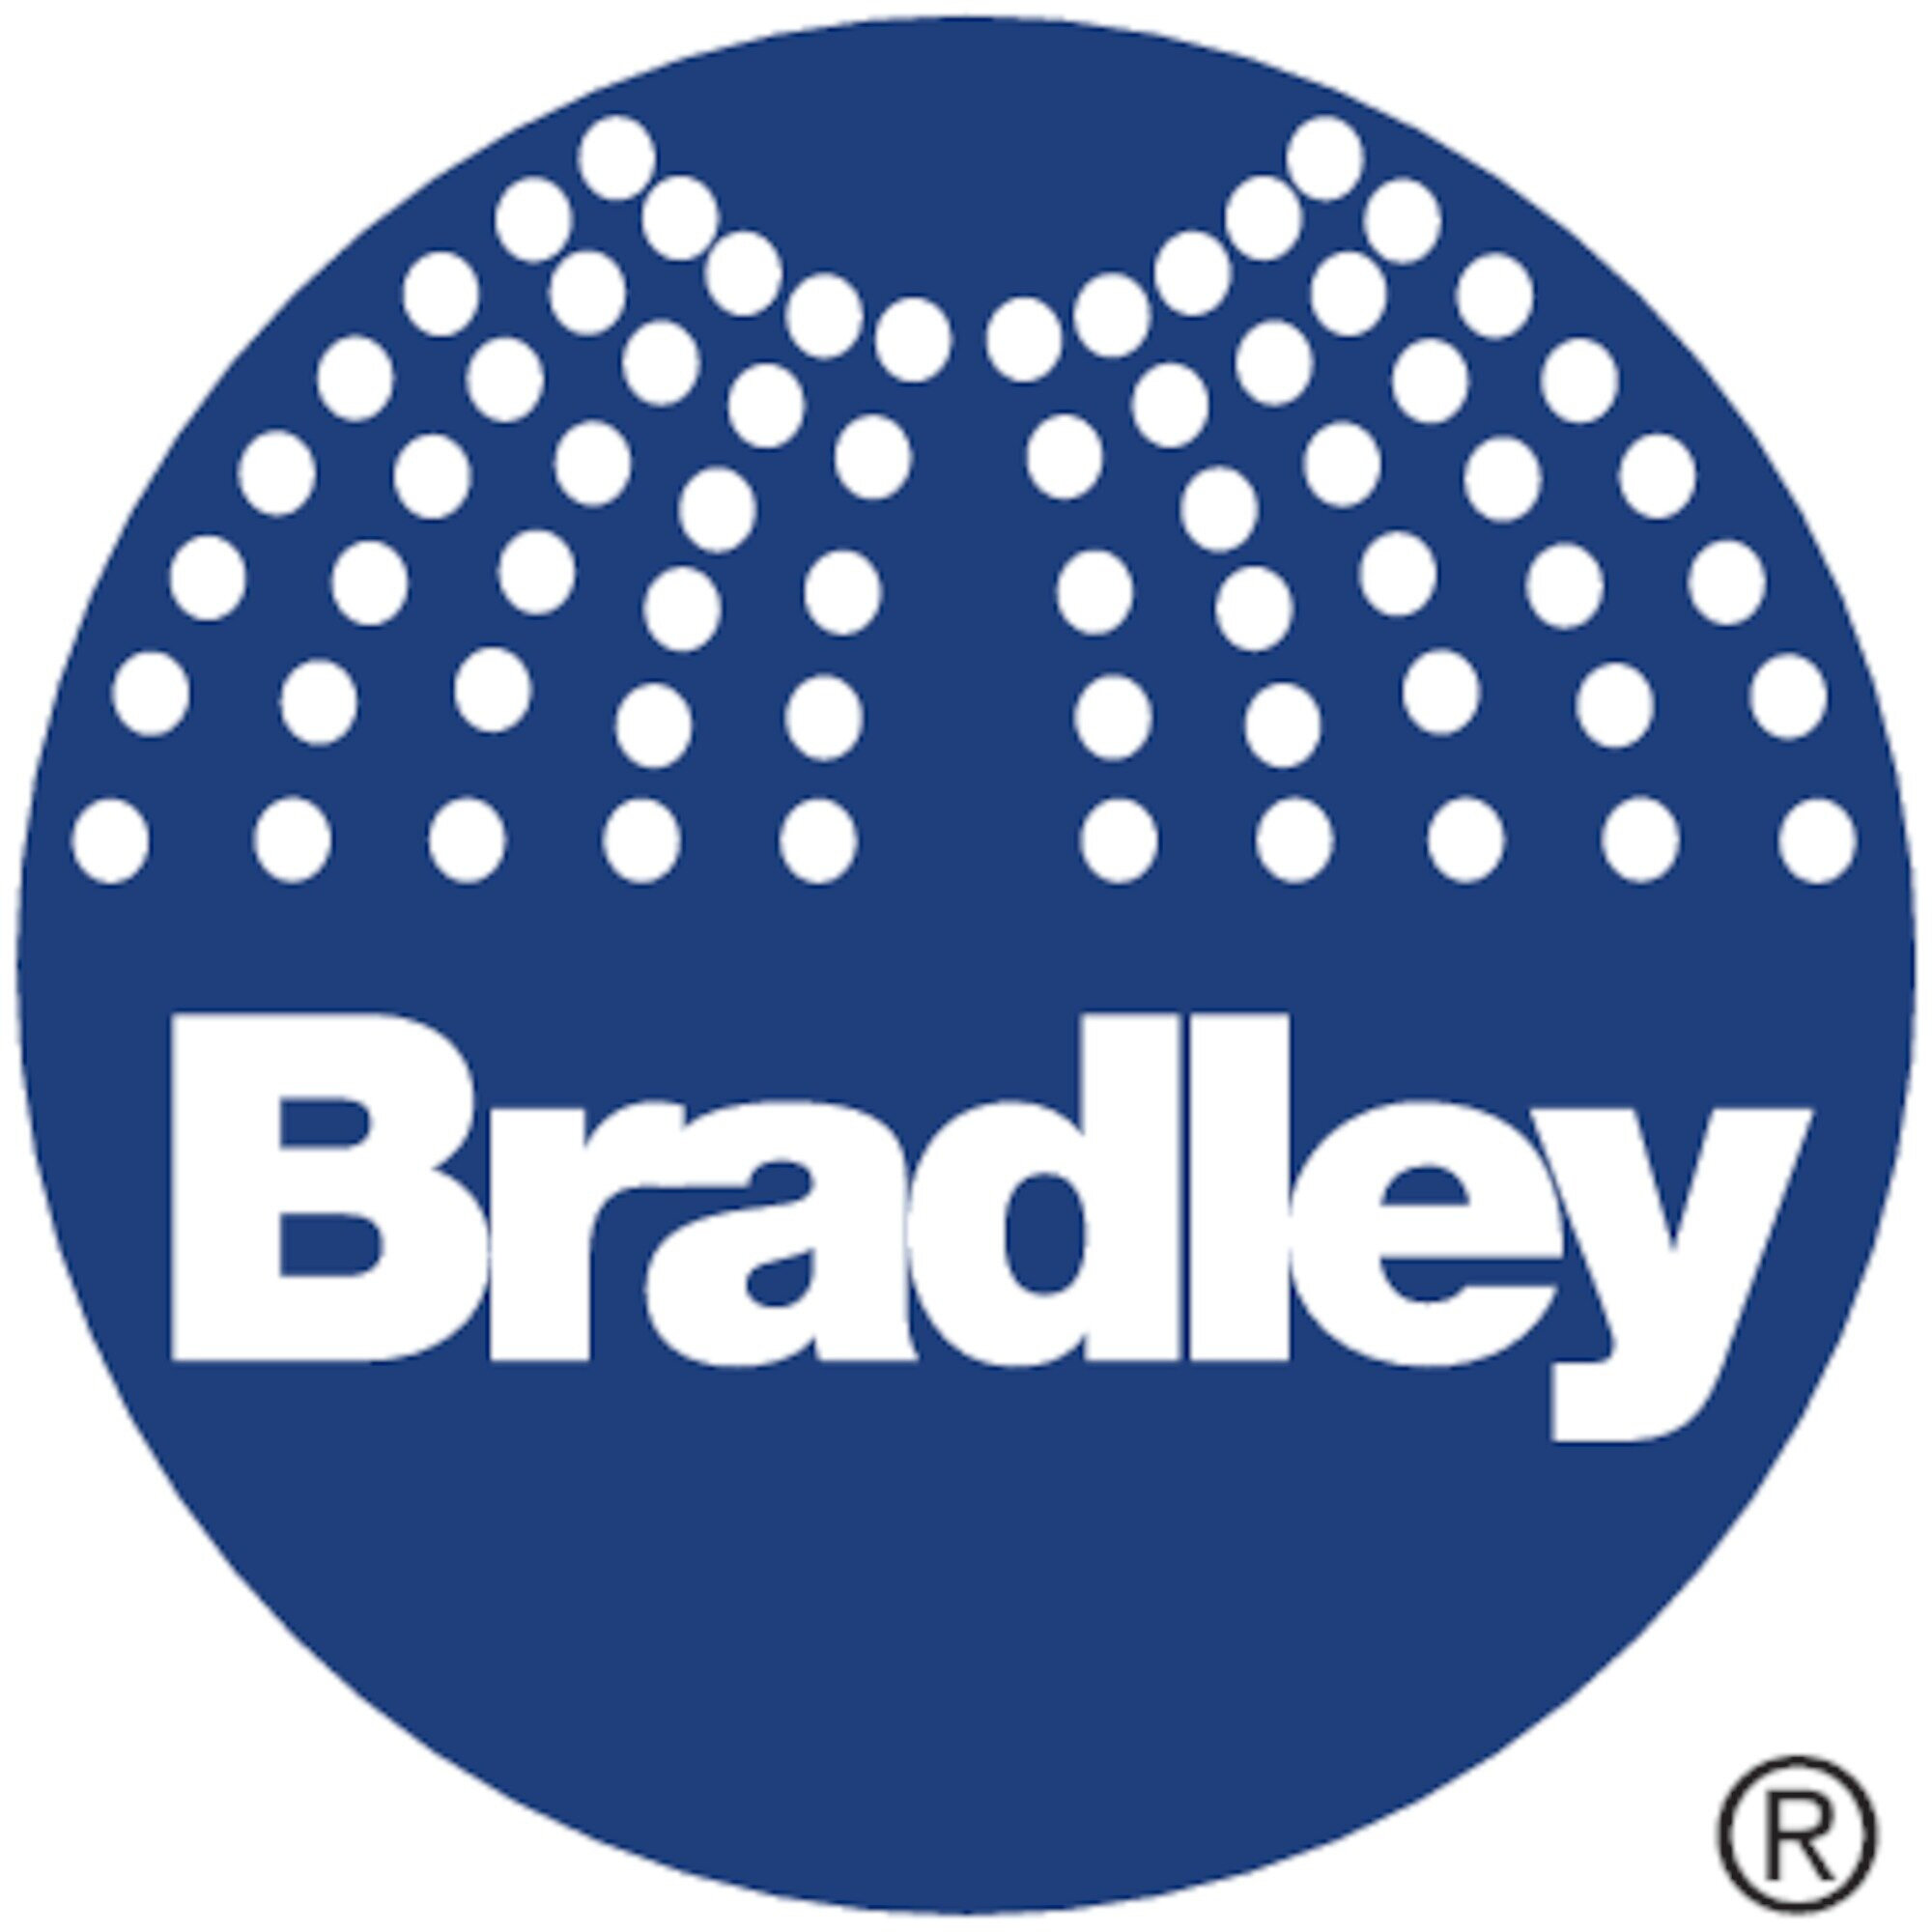 Bradley.jpg